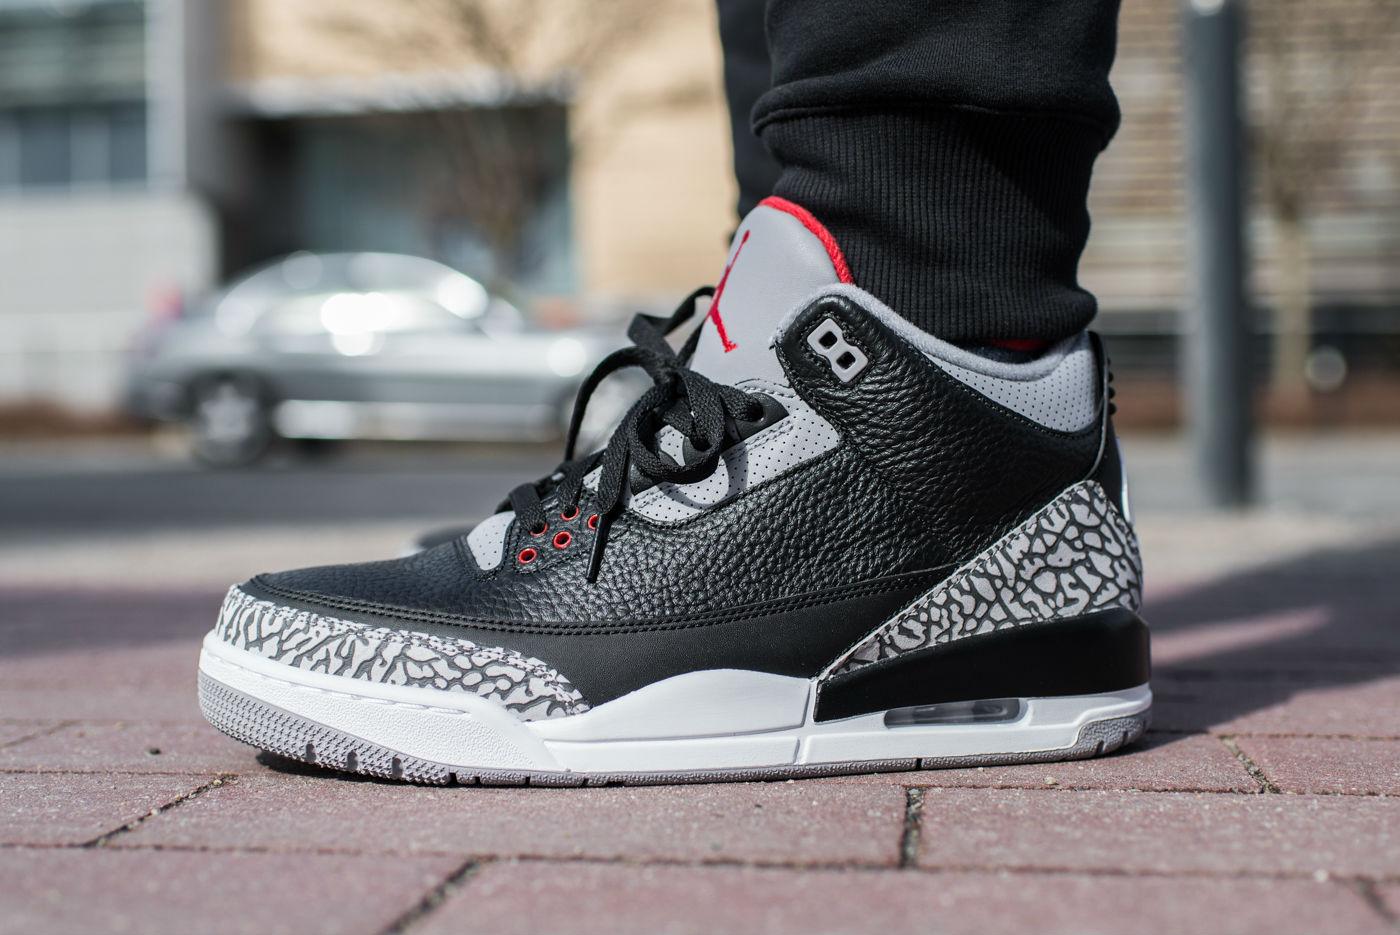 Air Jordan 3 Black Cement Restock Info   Cult Edge